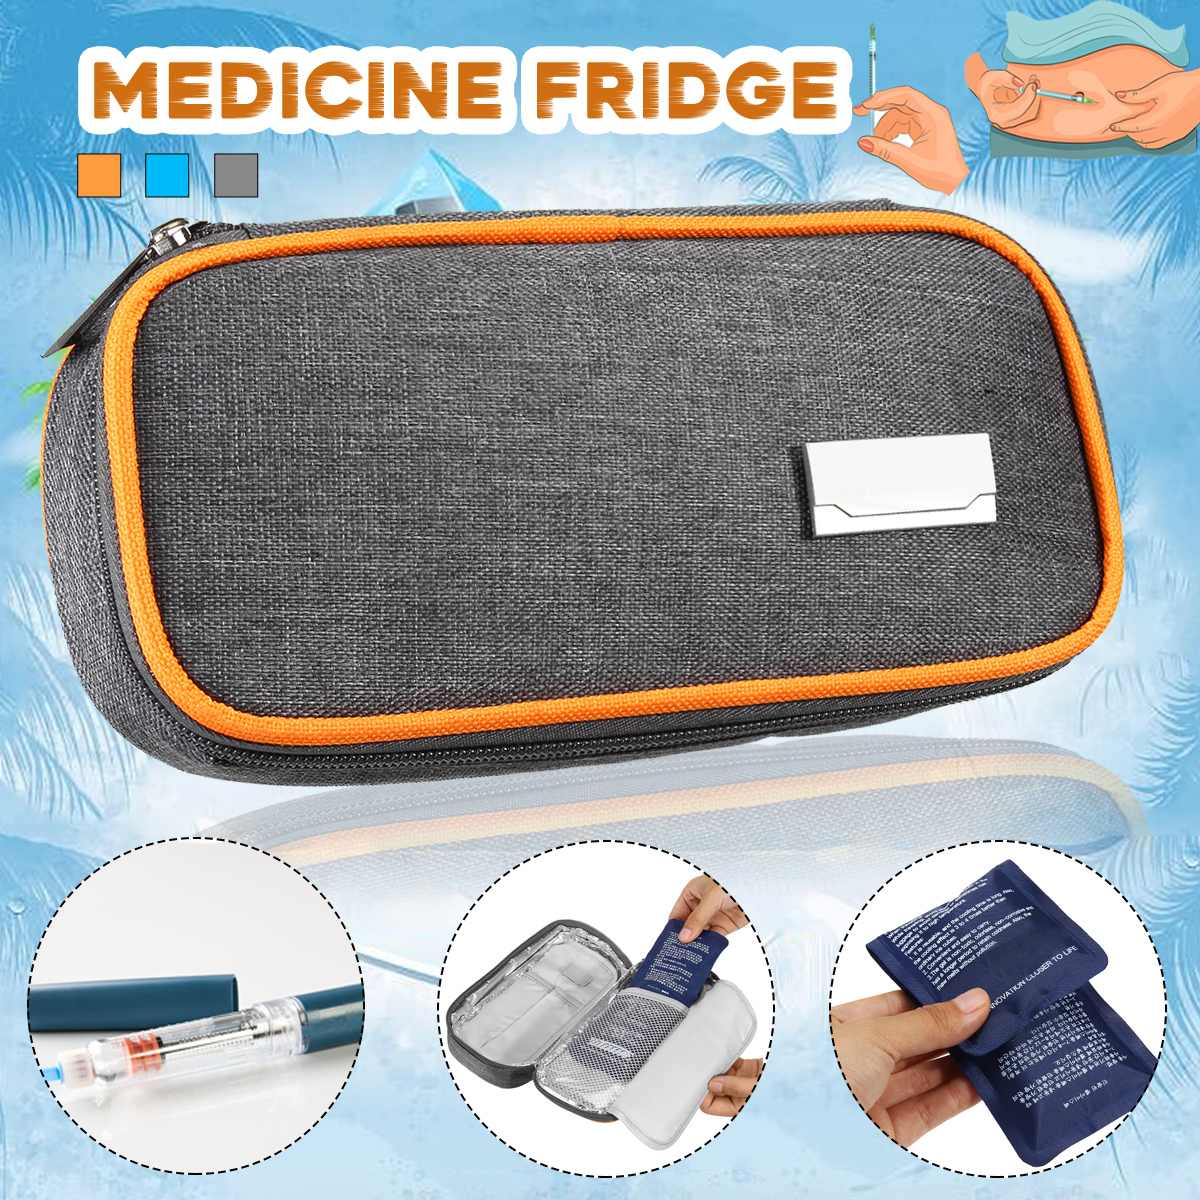 Portable Insulin Cool Cooler Bag Medicine Fridge With 2 Ice Bags Pill Box Bolsa Termica Aluminum Foil Ice Bag Cooler Pill Box